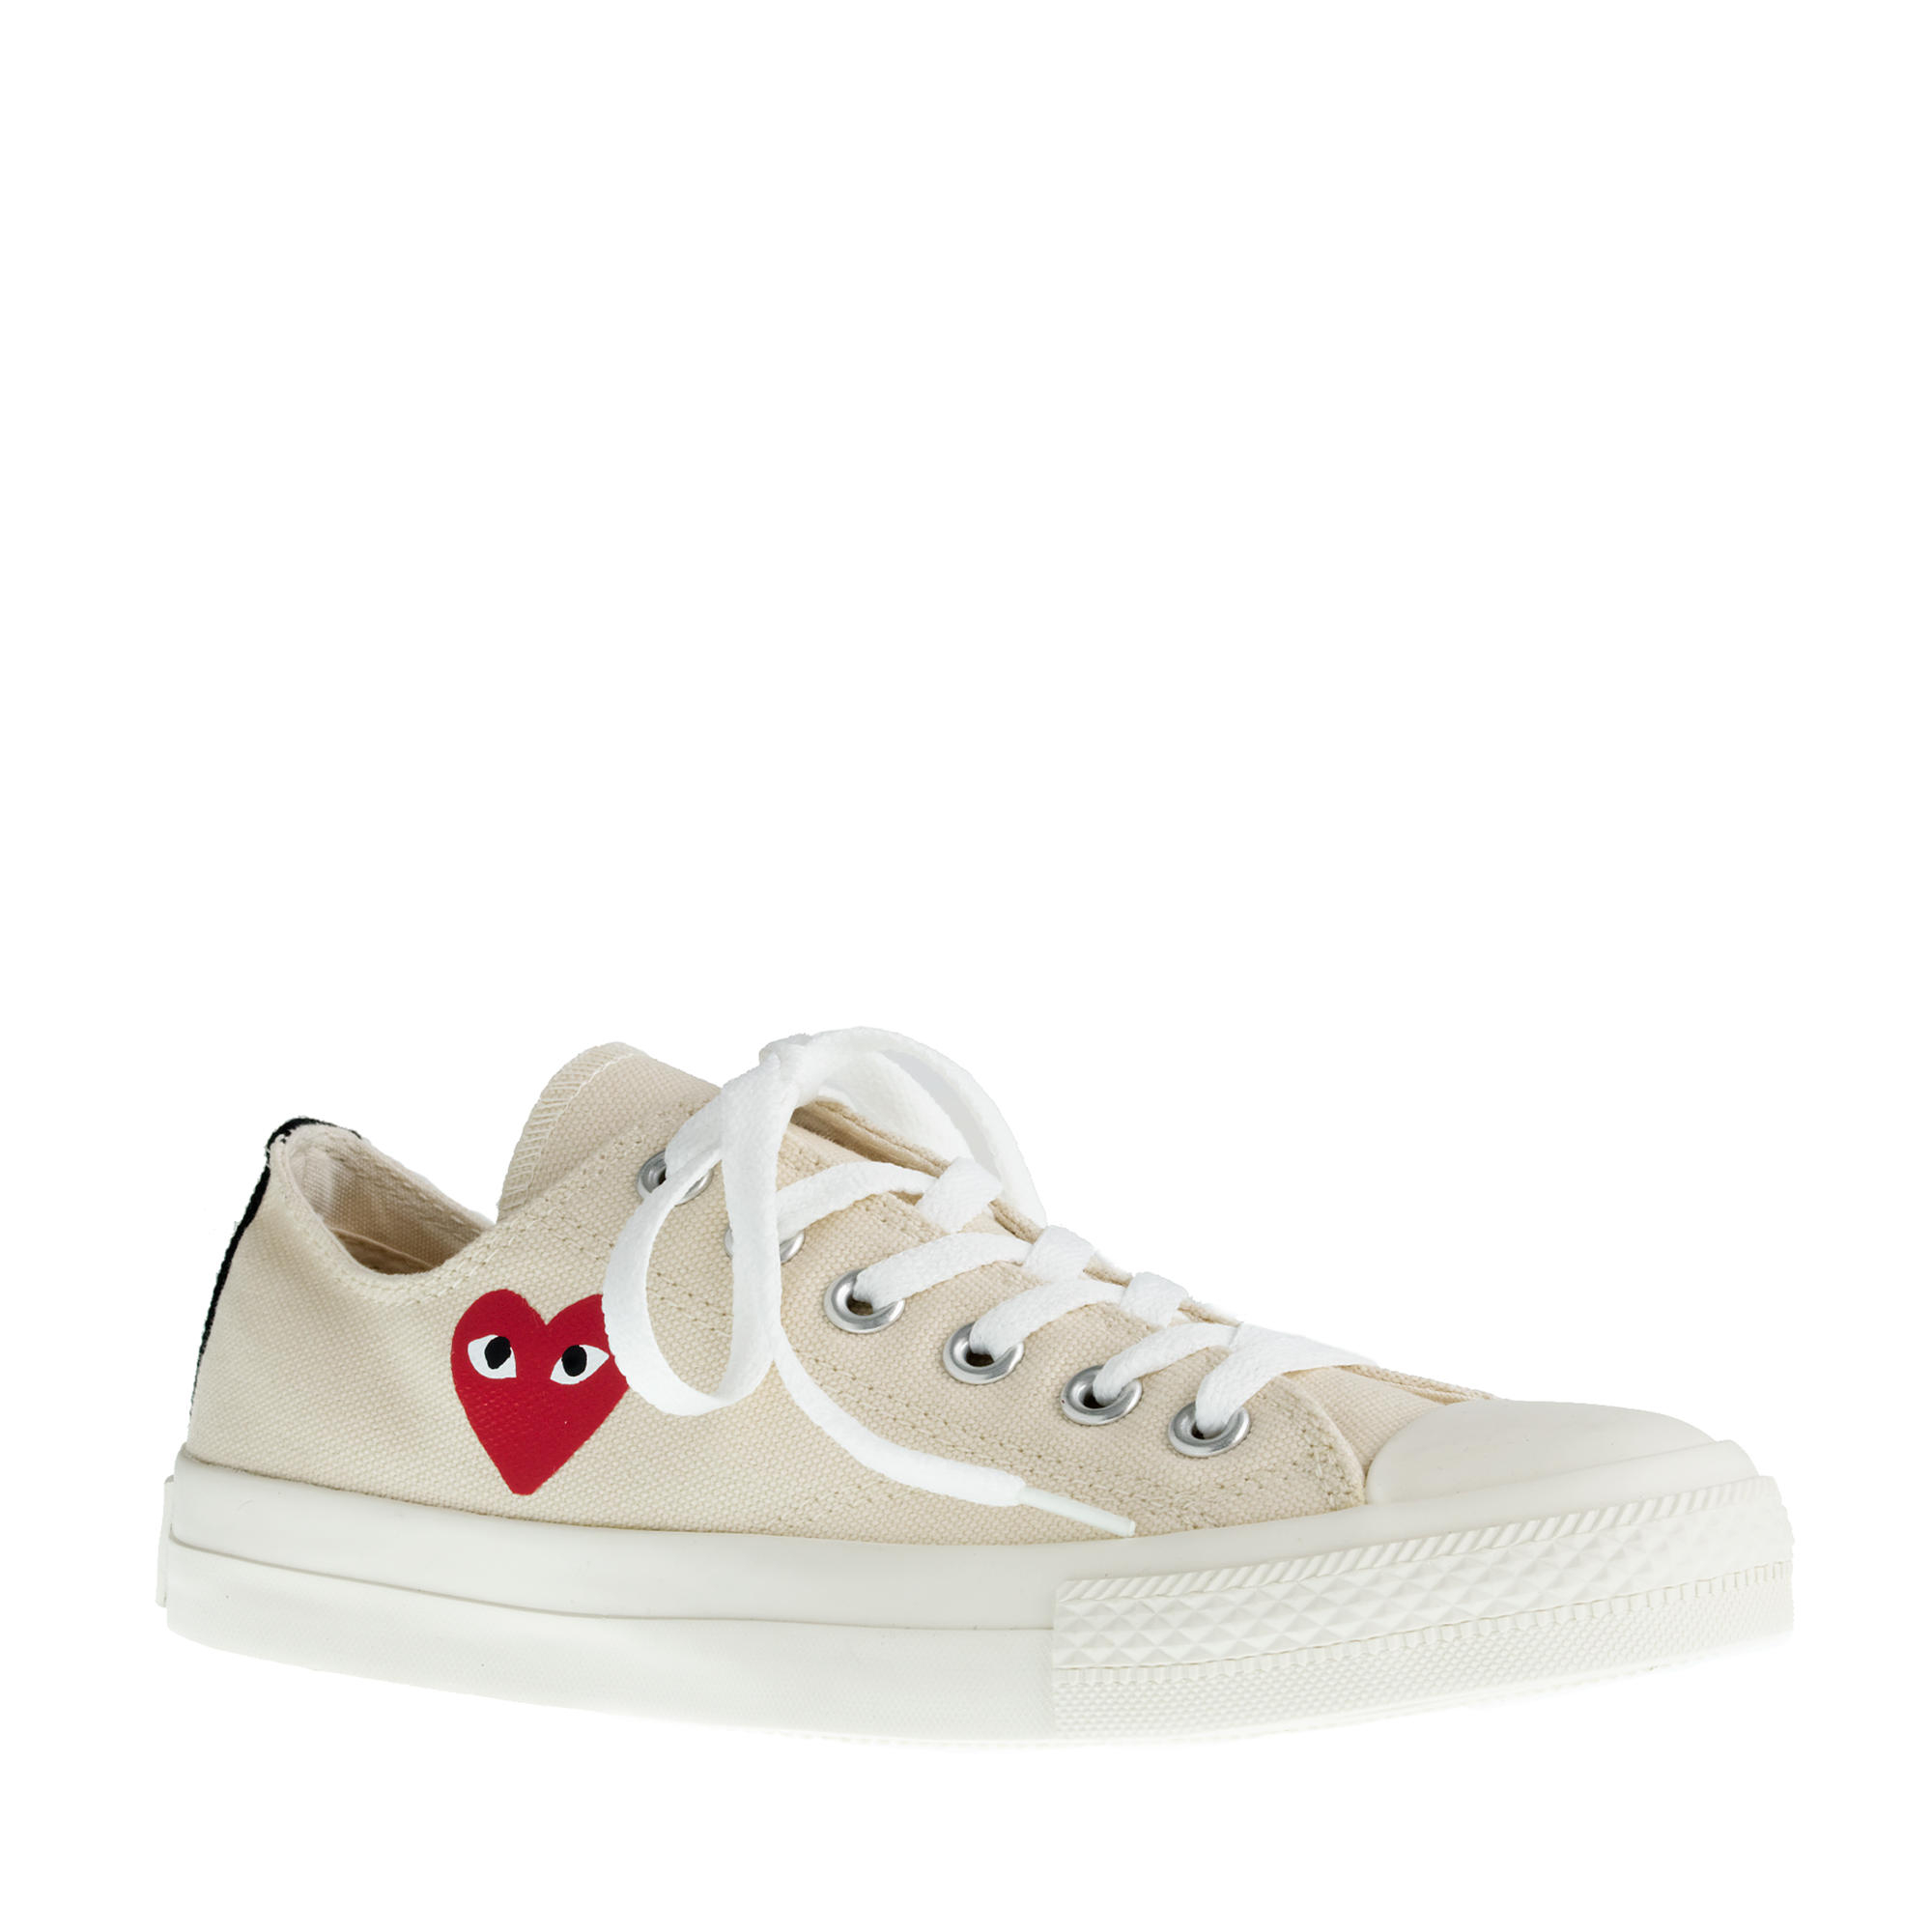 J.crew Unisex Play Comme Des Garçons Converse Sneakers in ...